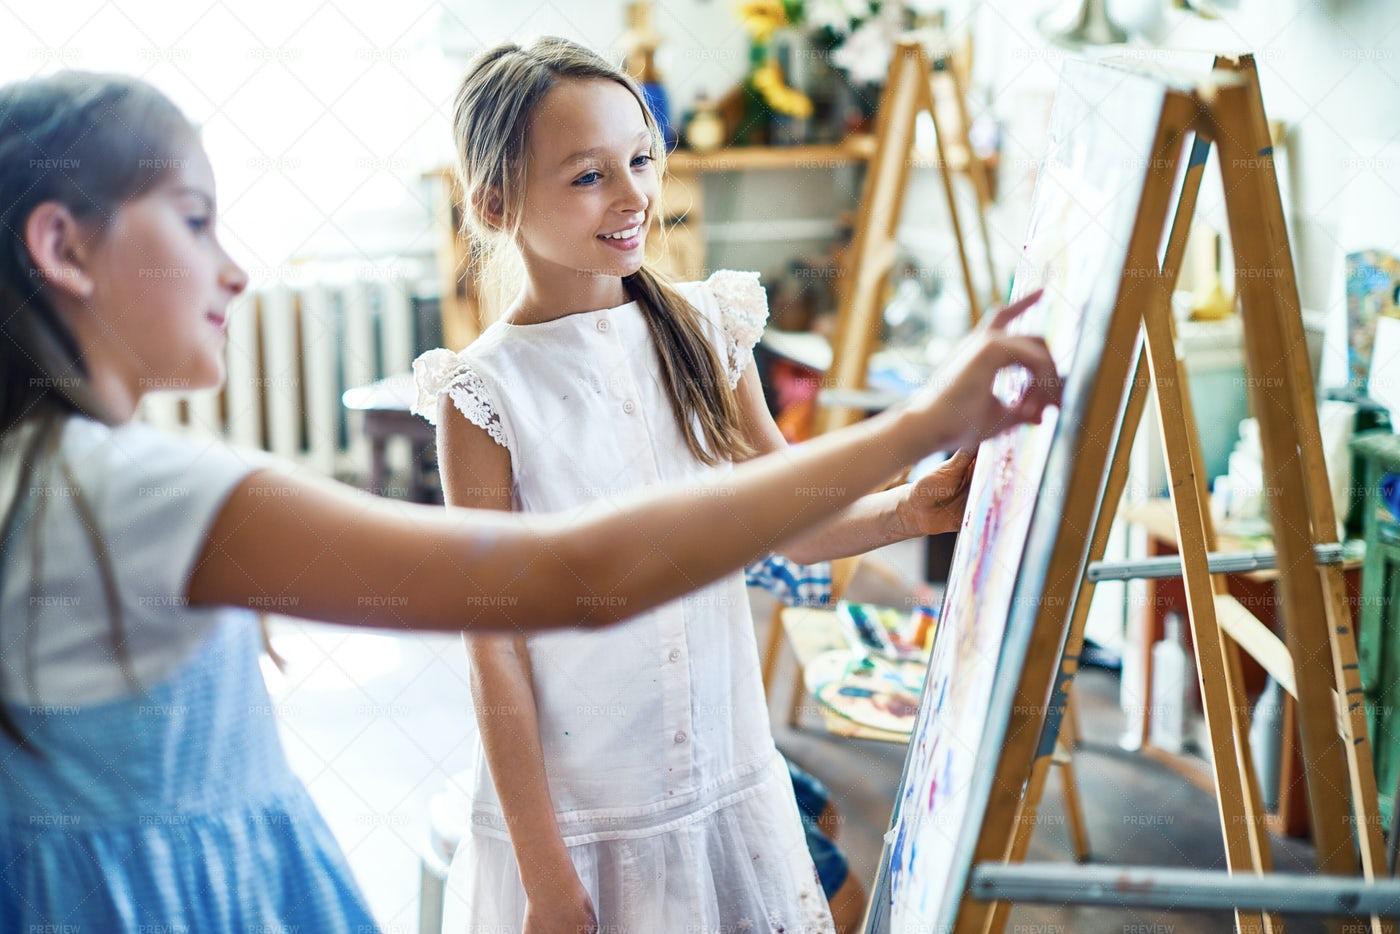 Creating Artwork Together: Stock Photos